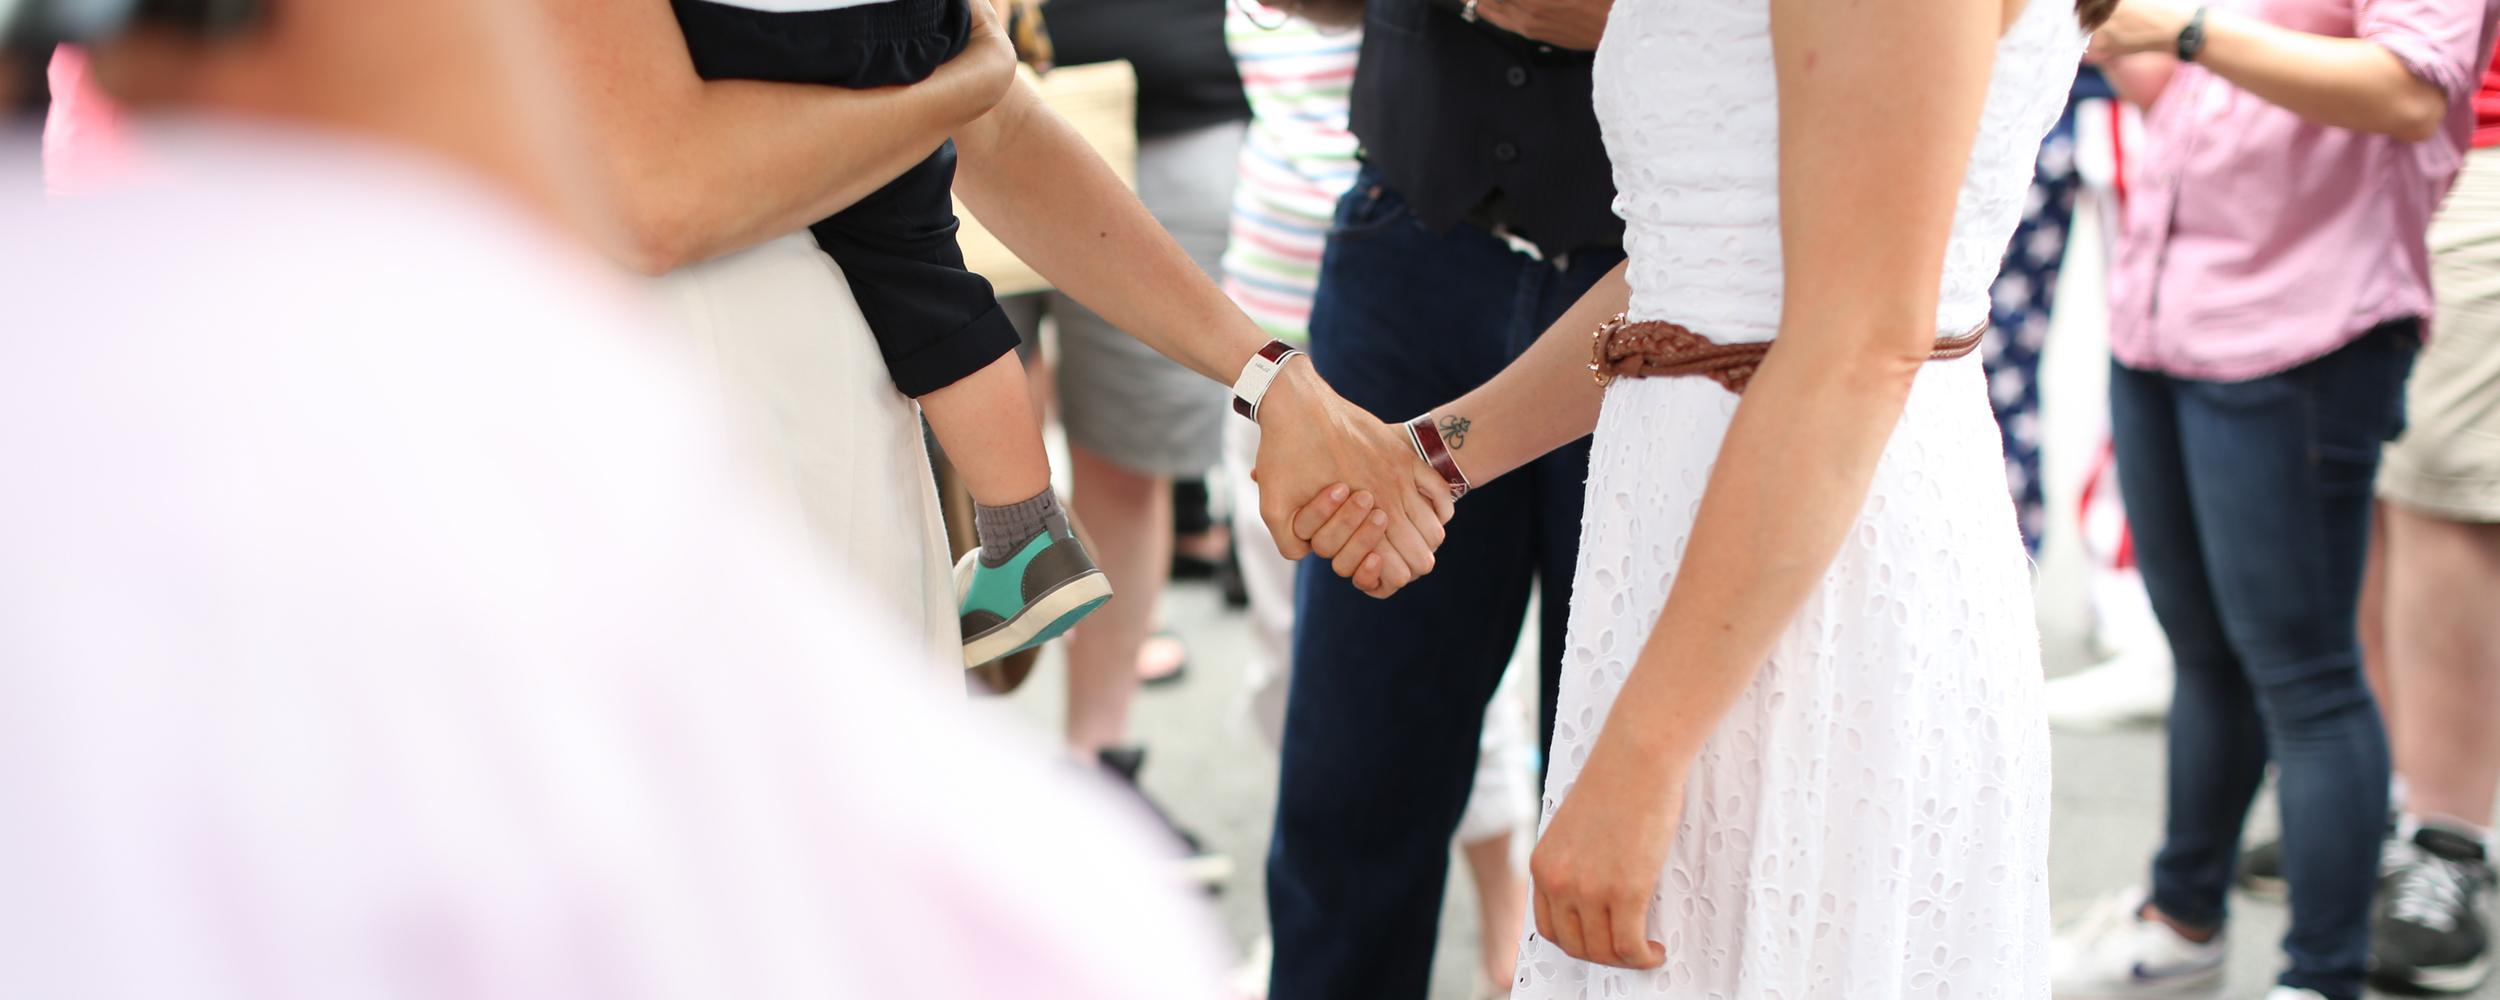 FEVA TAPROOM MARRIAGE CELBRATION SCOTUS RULING 2015 WEBSITE  (41 of 91).jpg